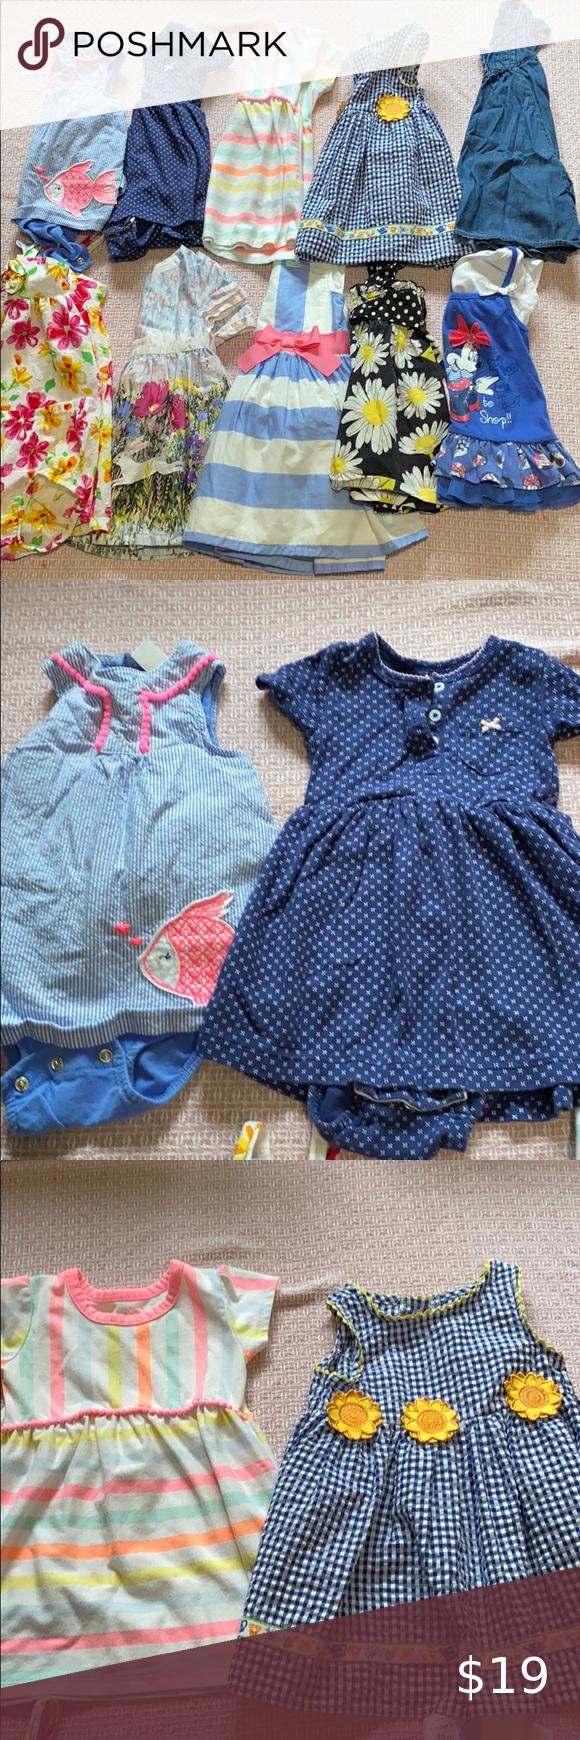 12 Month Dress Lot 12 Month Dress Dresses Kids Dresses [ 1740 x 580 Pixel ]